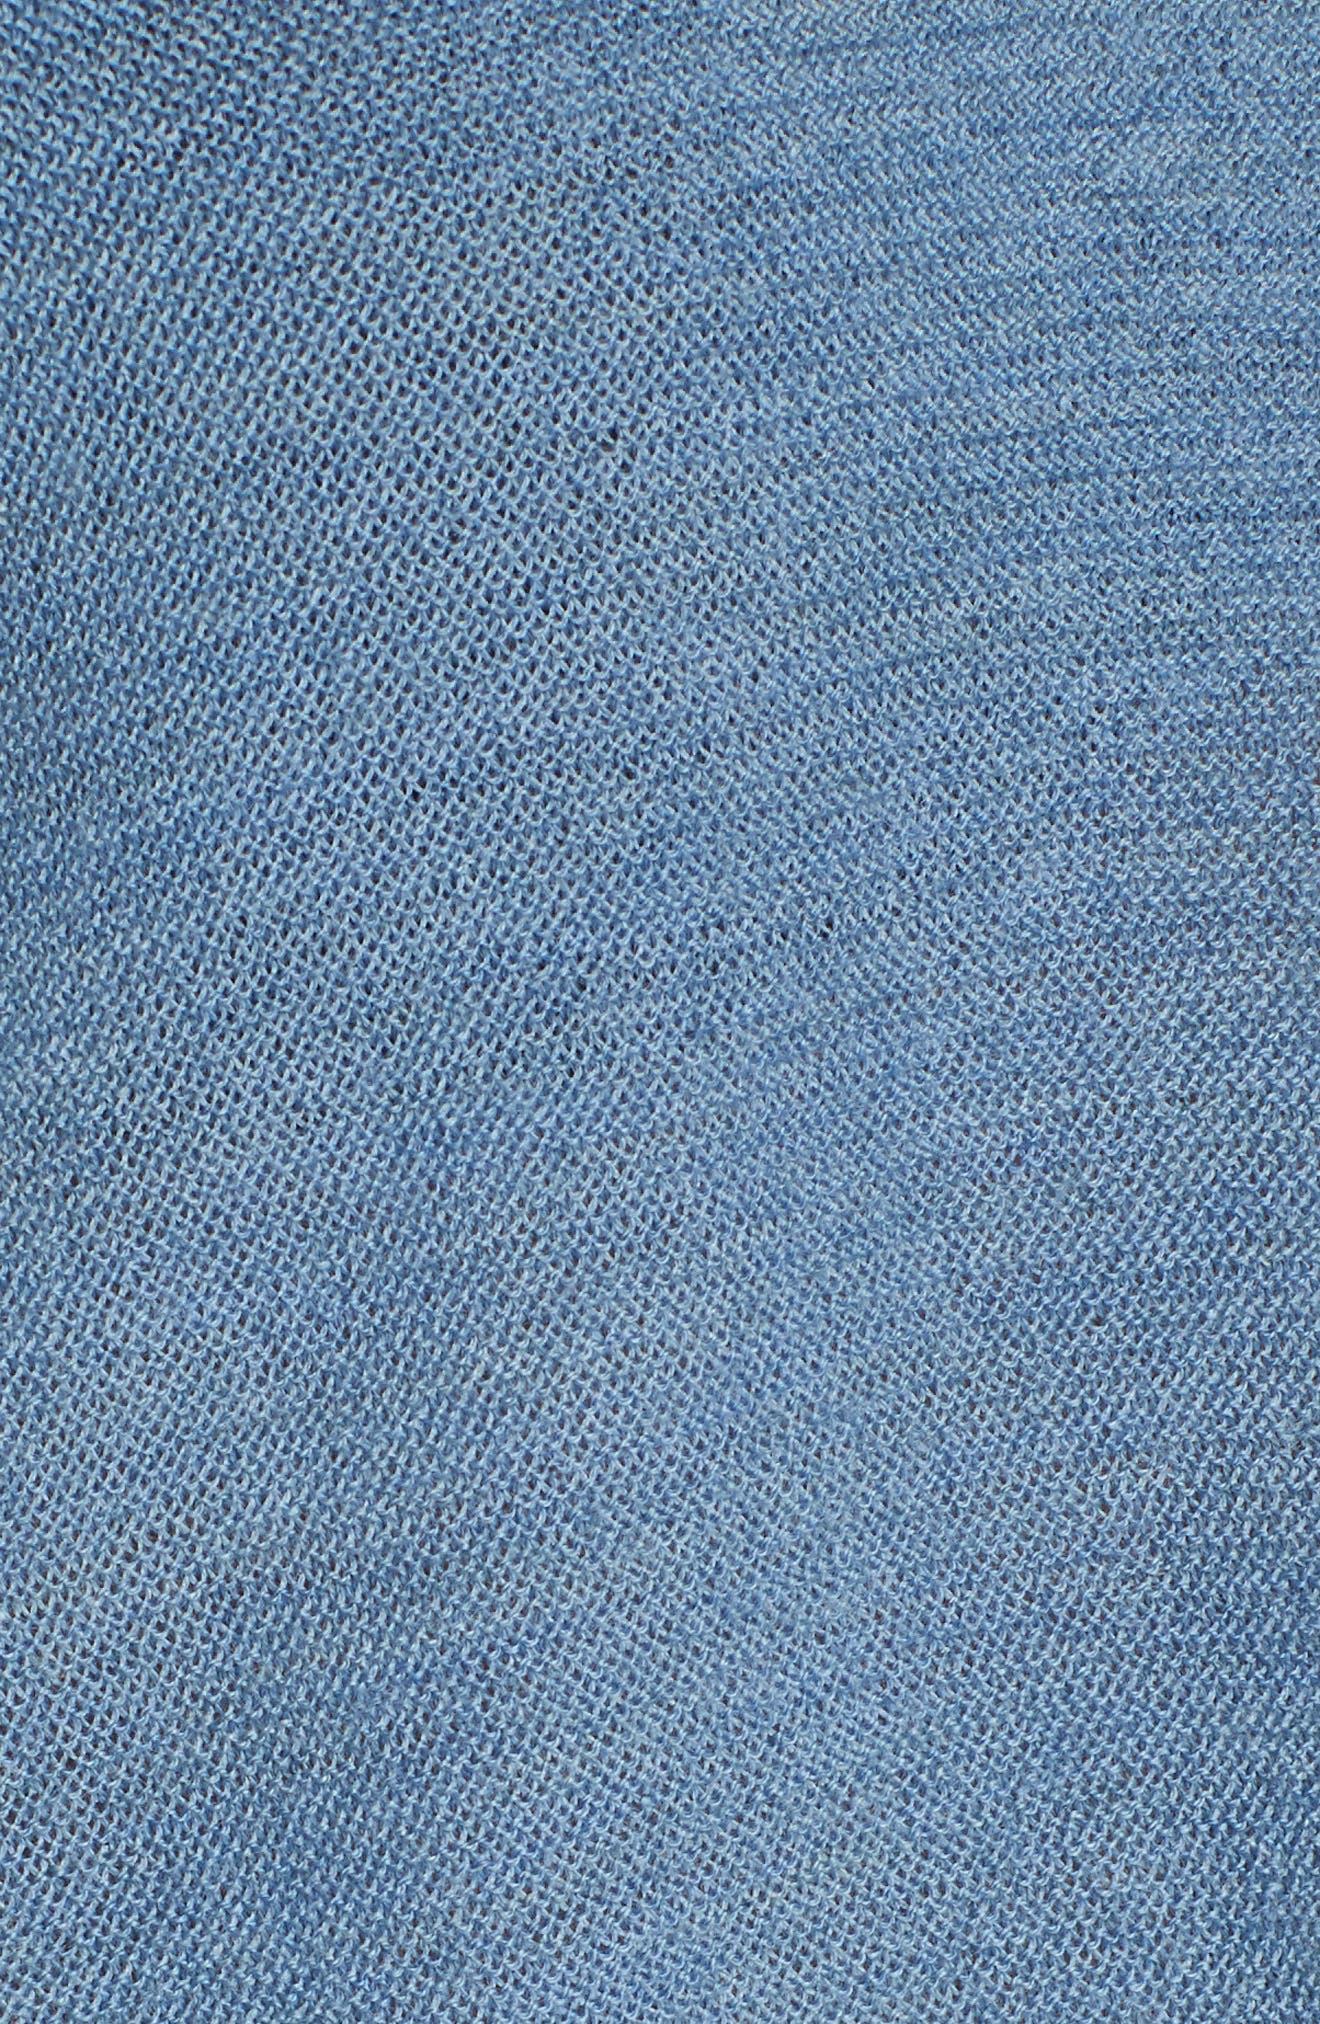 Alternate Image 5  - Eileen Fisher High/Low Merino Wool Sweater